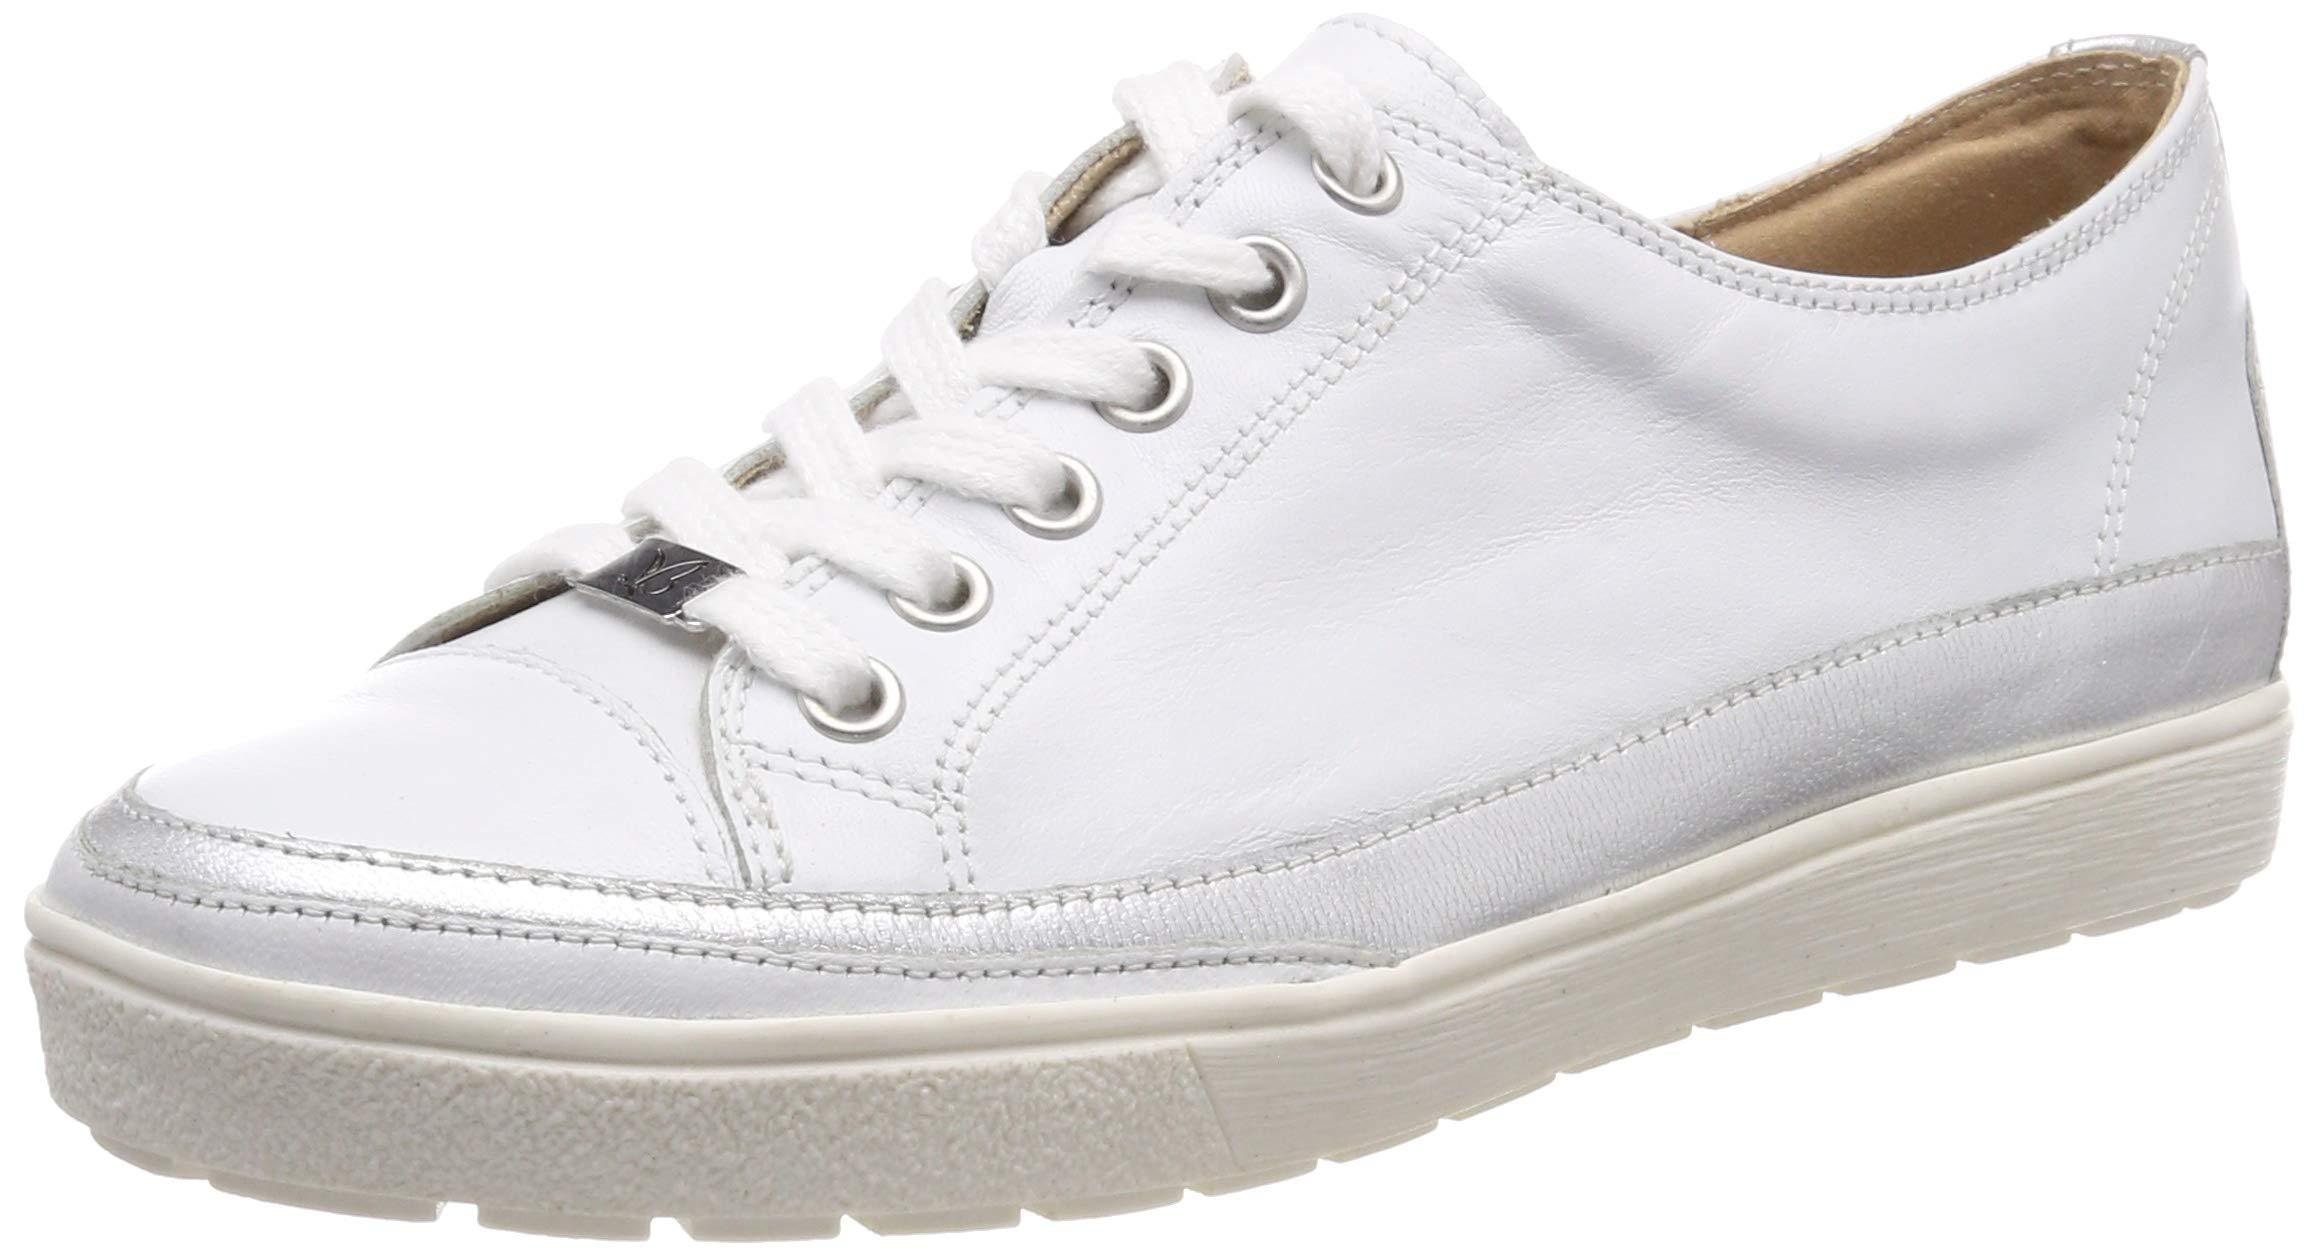 Nappa Eu ManouSneakers 10240 Caprice Basses 5 FemmeBlancwhite 8wNOnPX0k